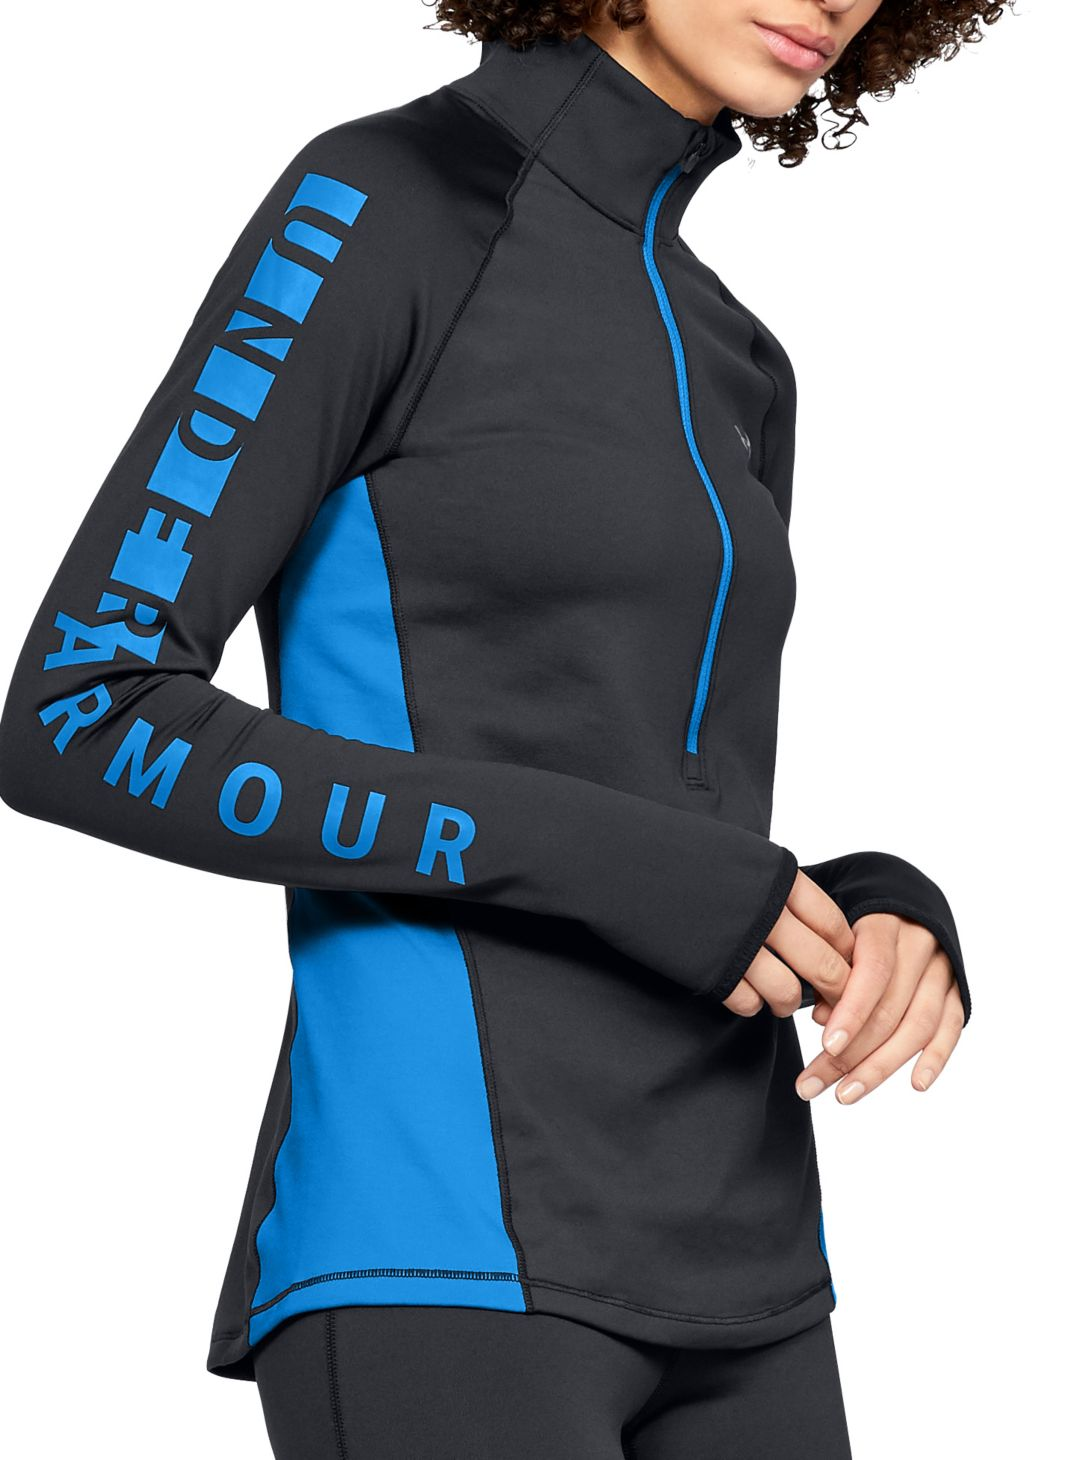 1cbce90eb7 Under Armour Women's ColdGear Armour Graphic ½ Zip Long Sleeve Shirt